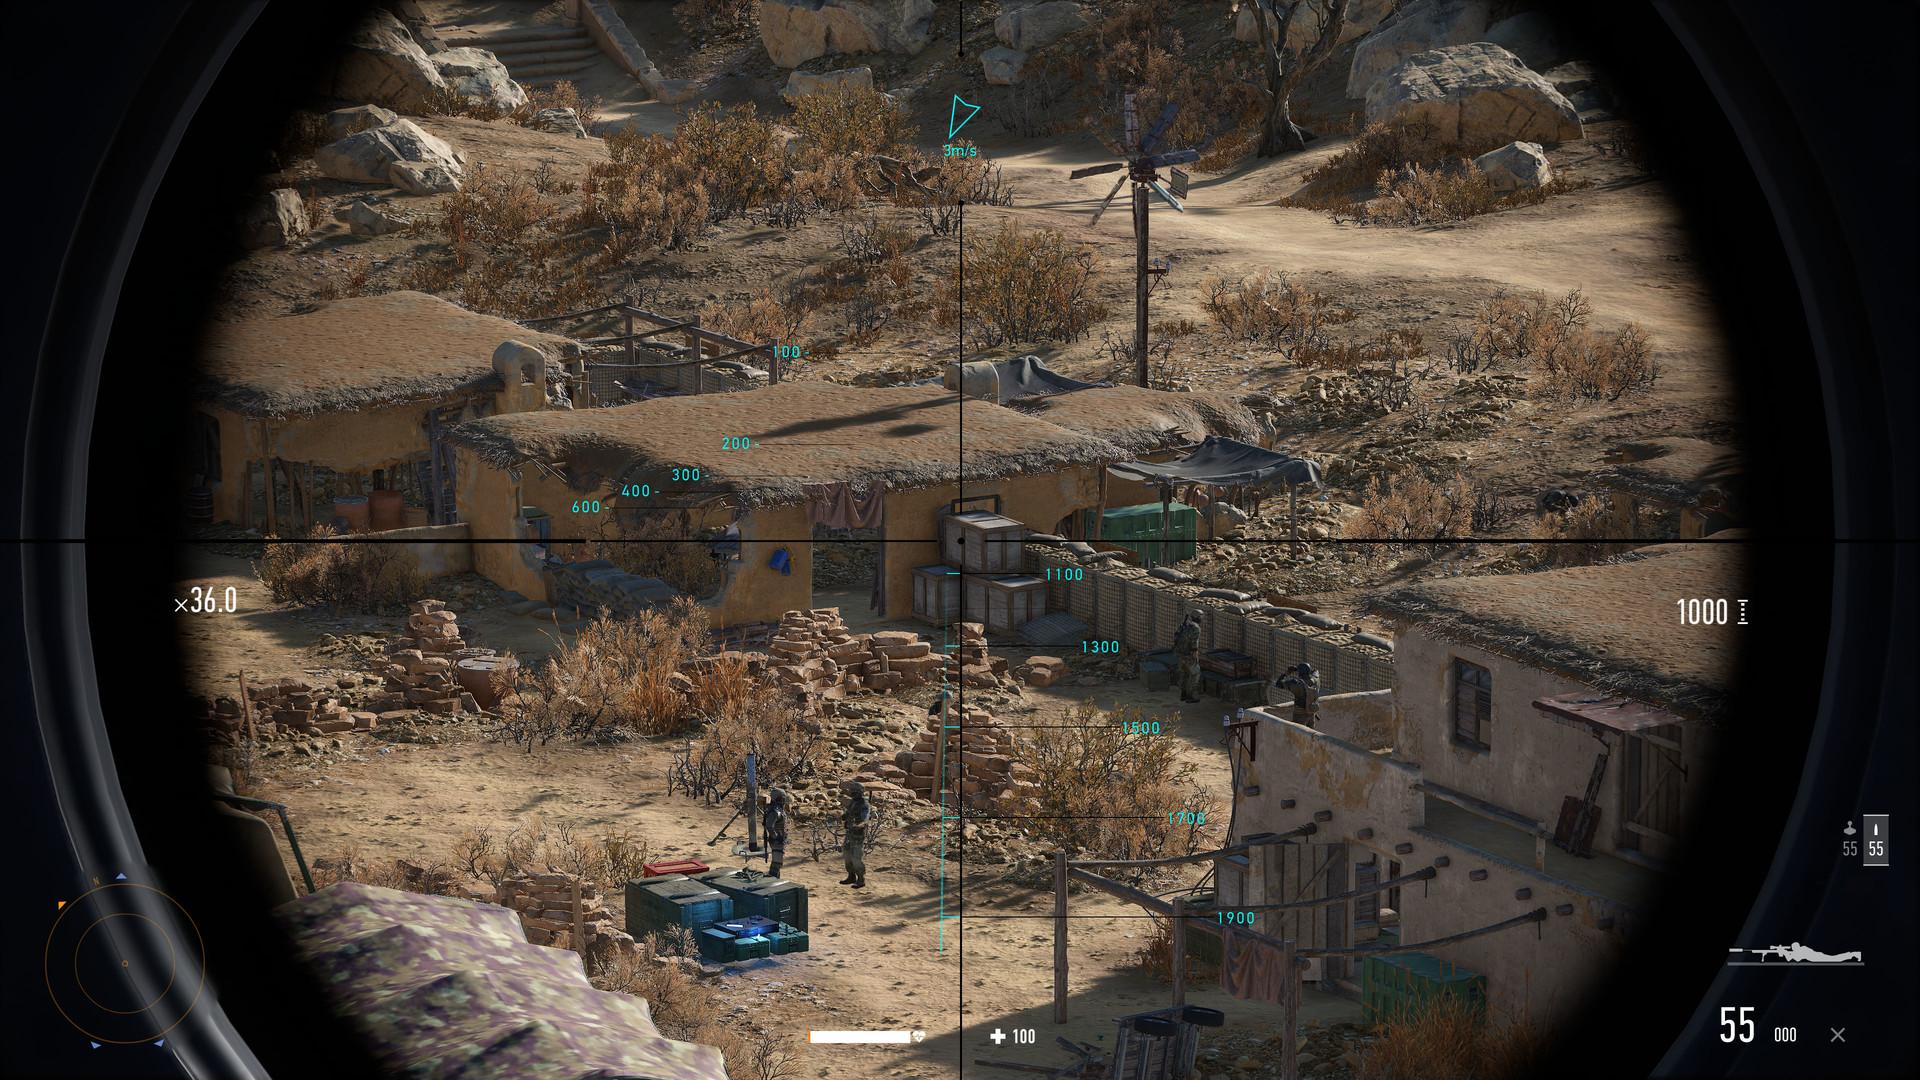 Sniper Ghost Warrior 1212021 1